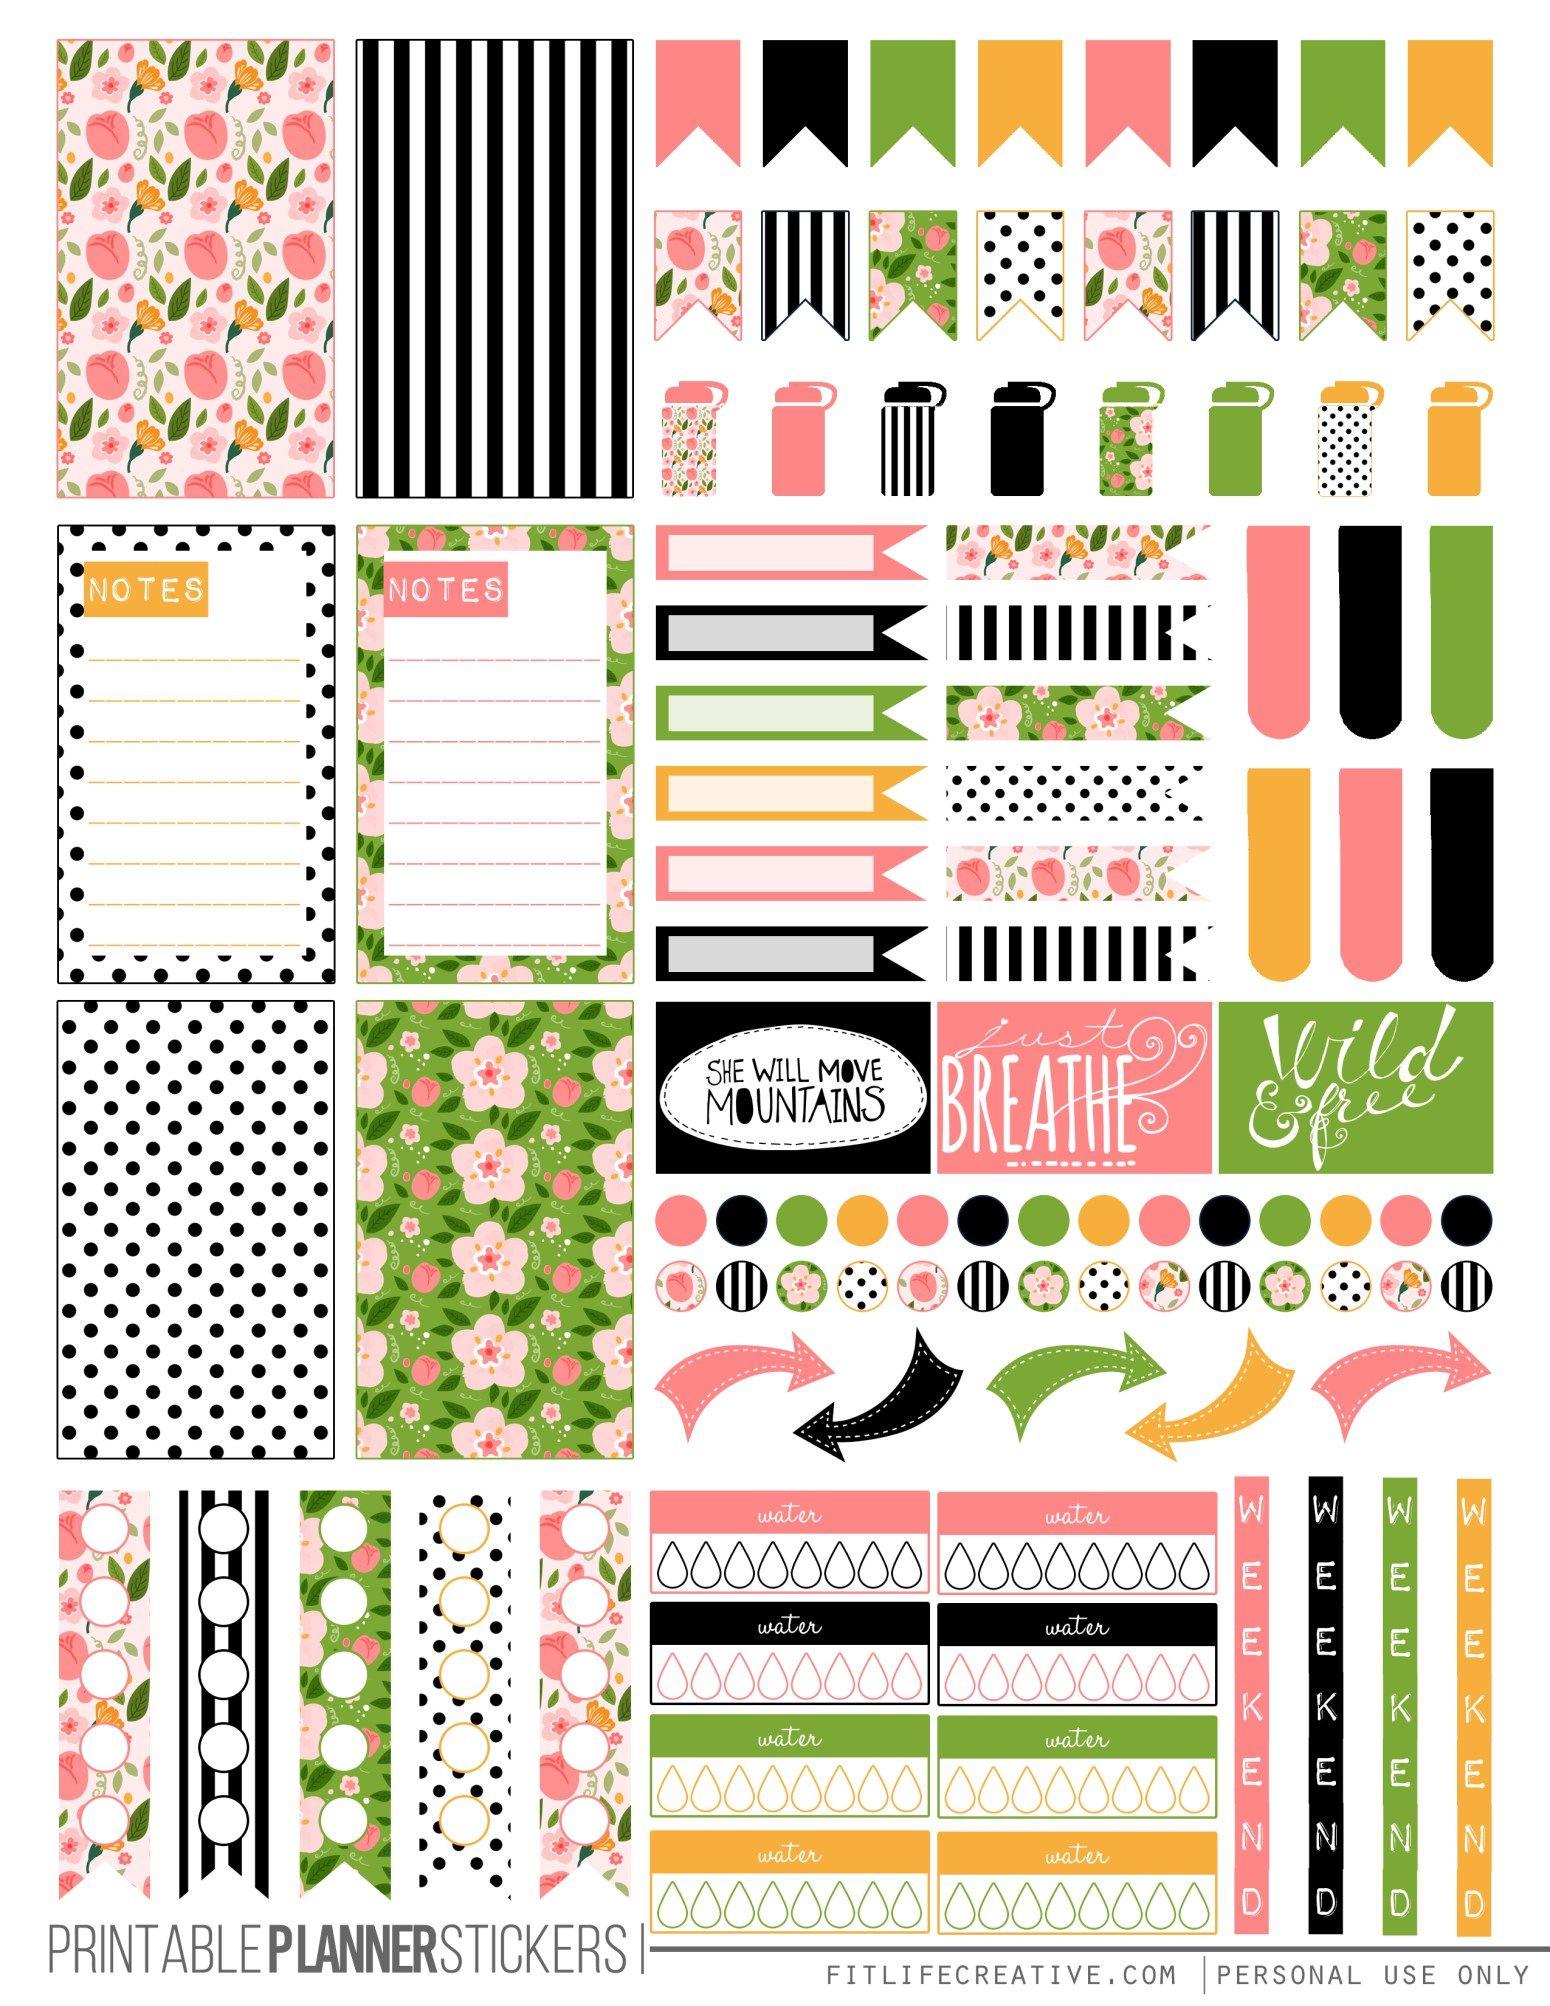 Spring Floral Planner Stickers Planner Printables Free Happy Planner Stickers Planner Stickers